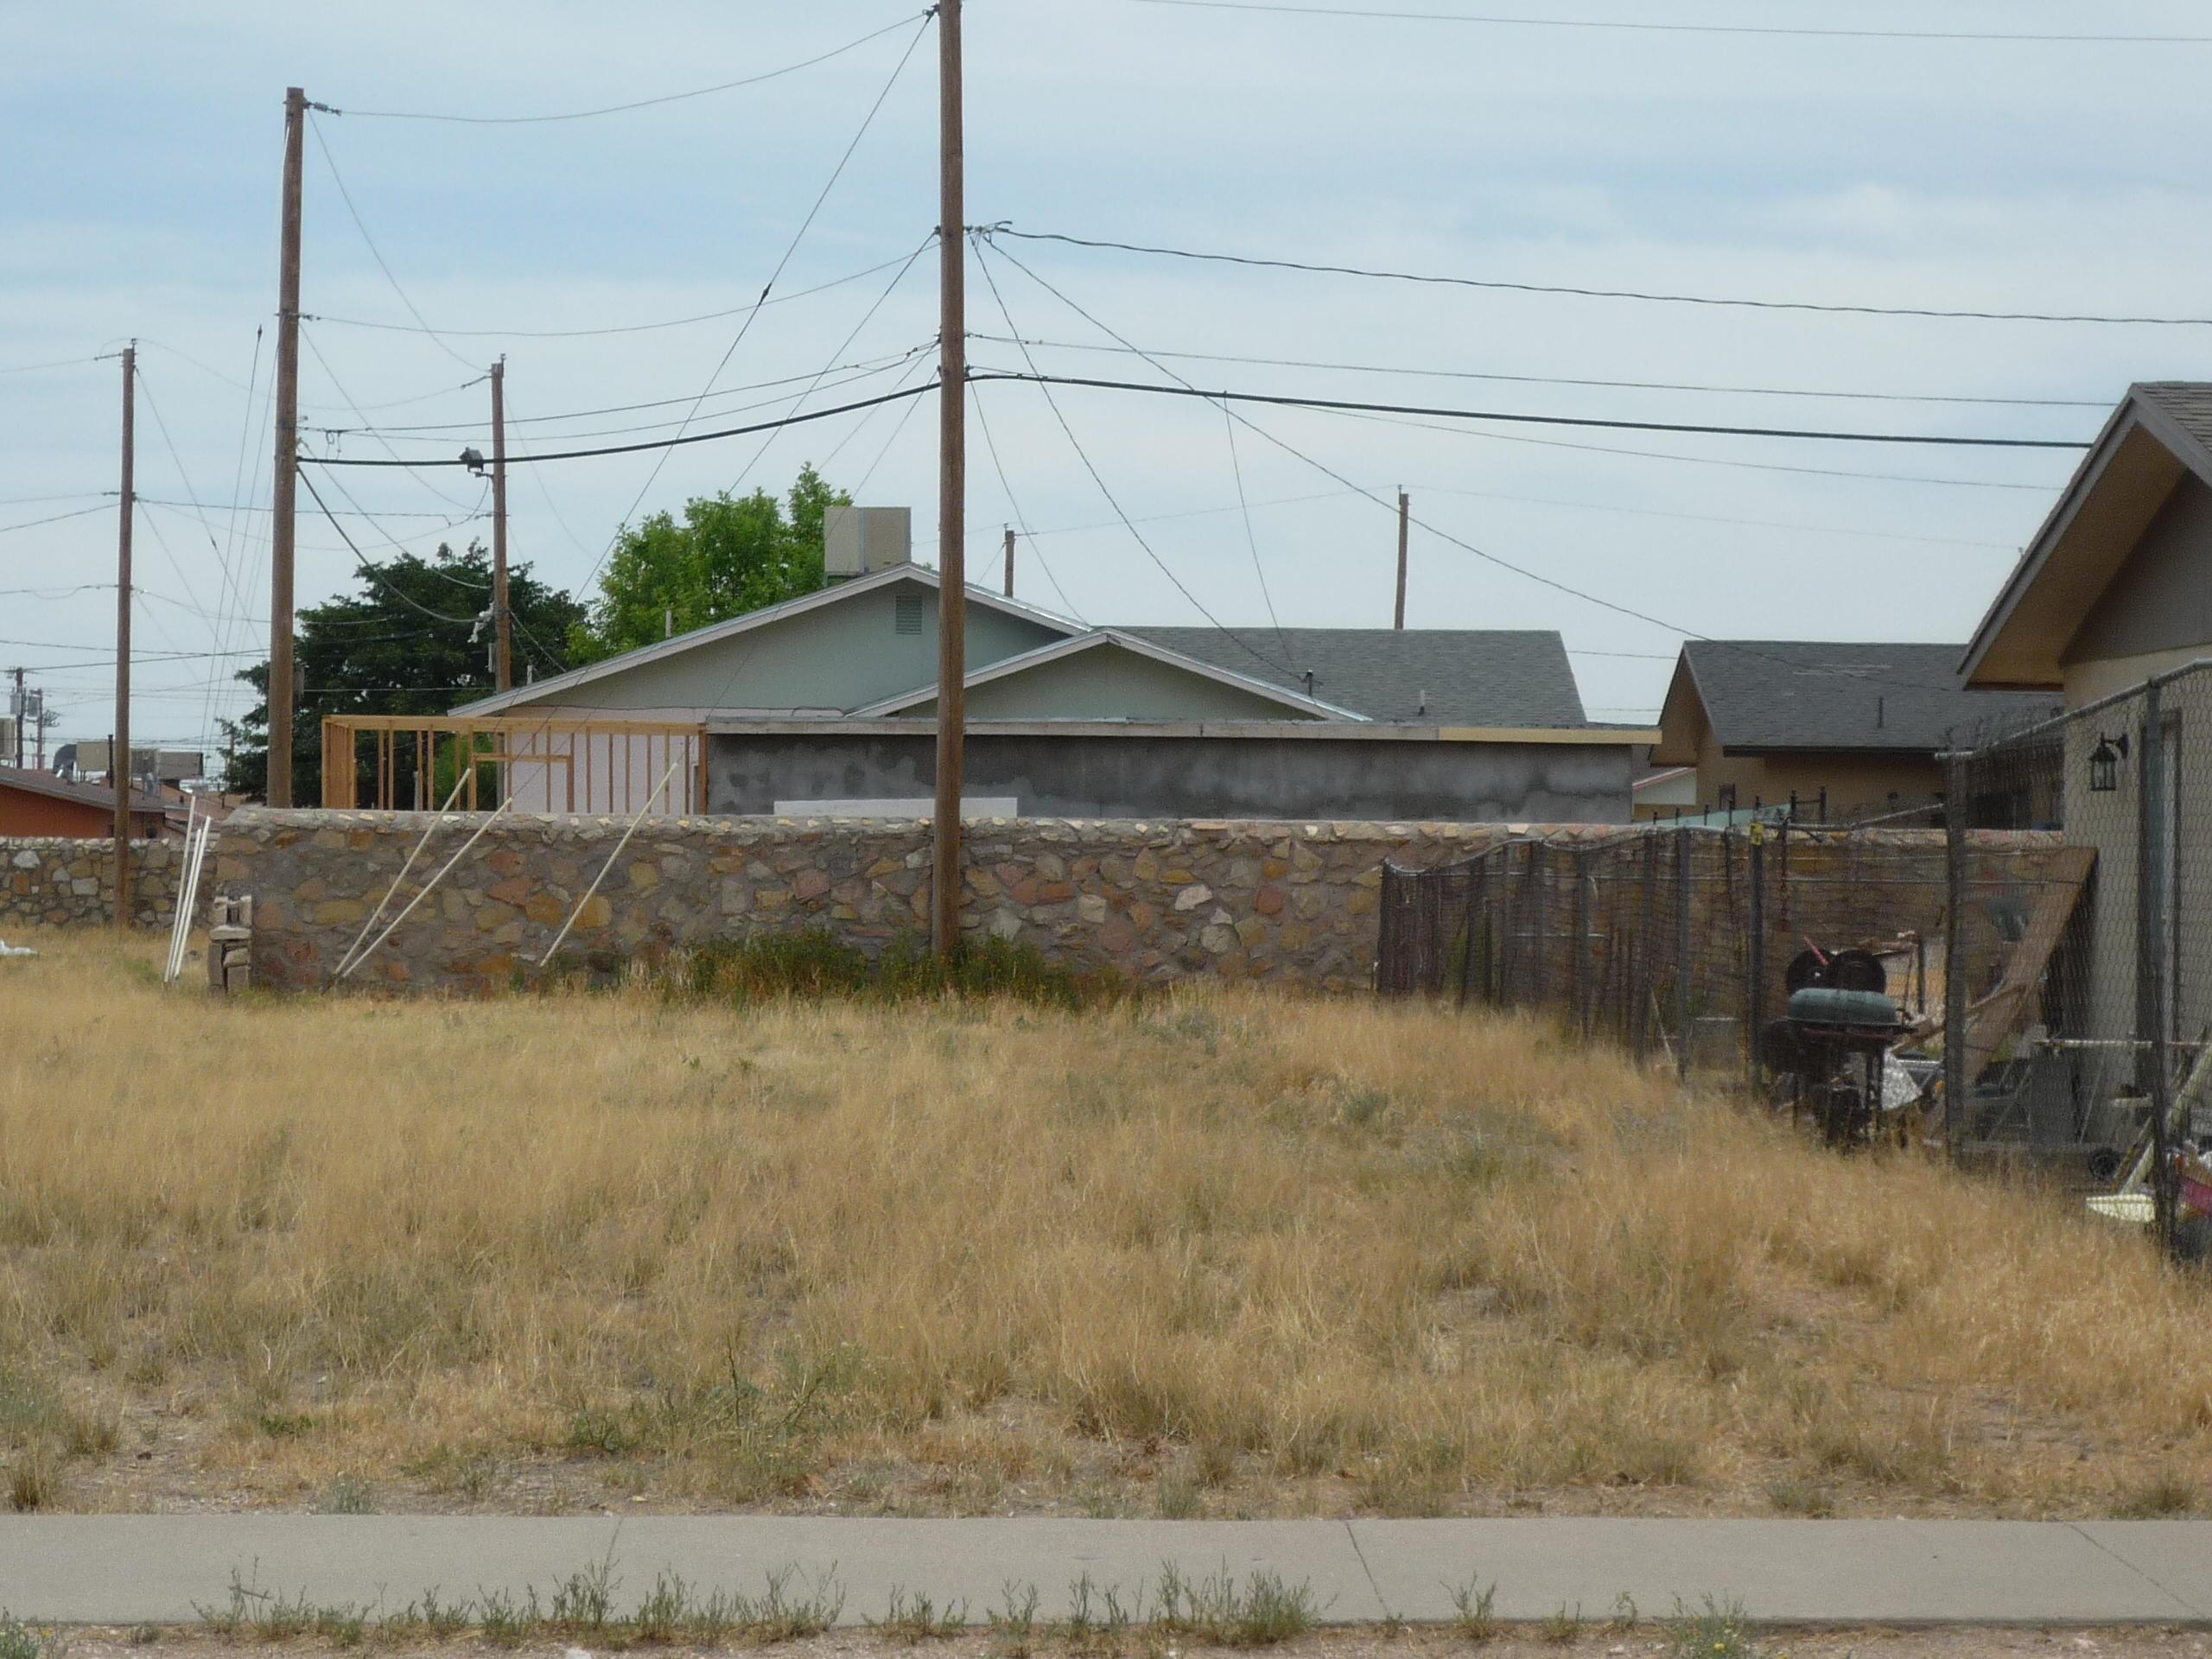 0 Pandora, El Paso, Texas 79904, ,Residential,For sale,Pandora,826244